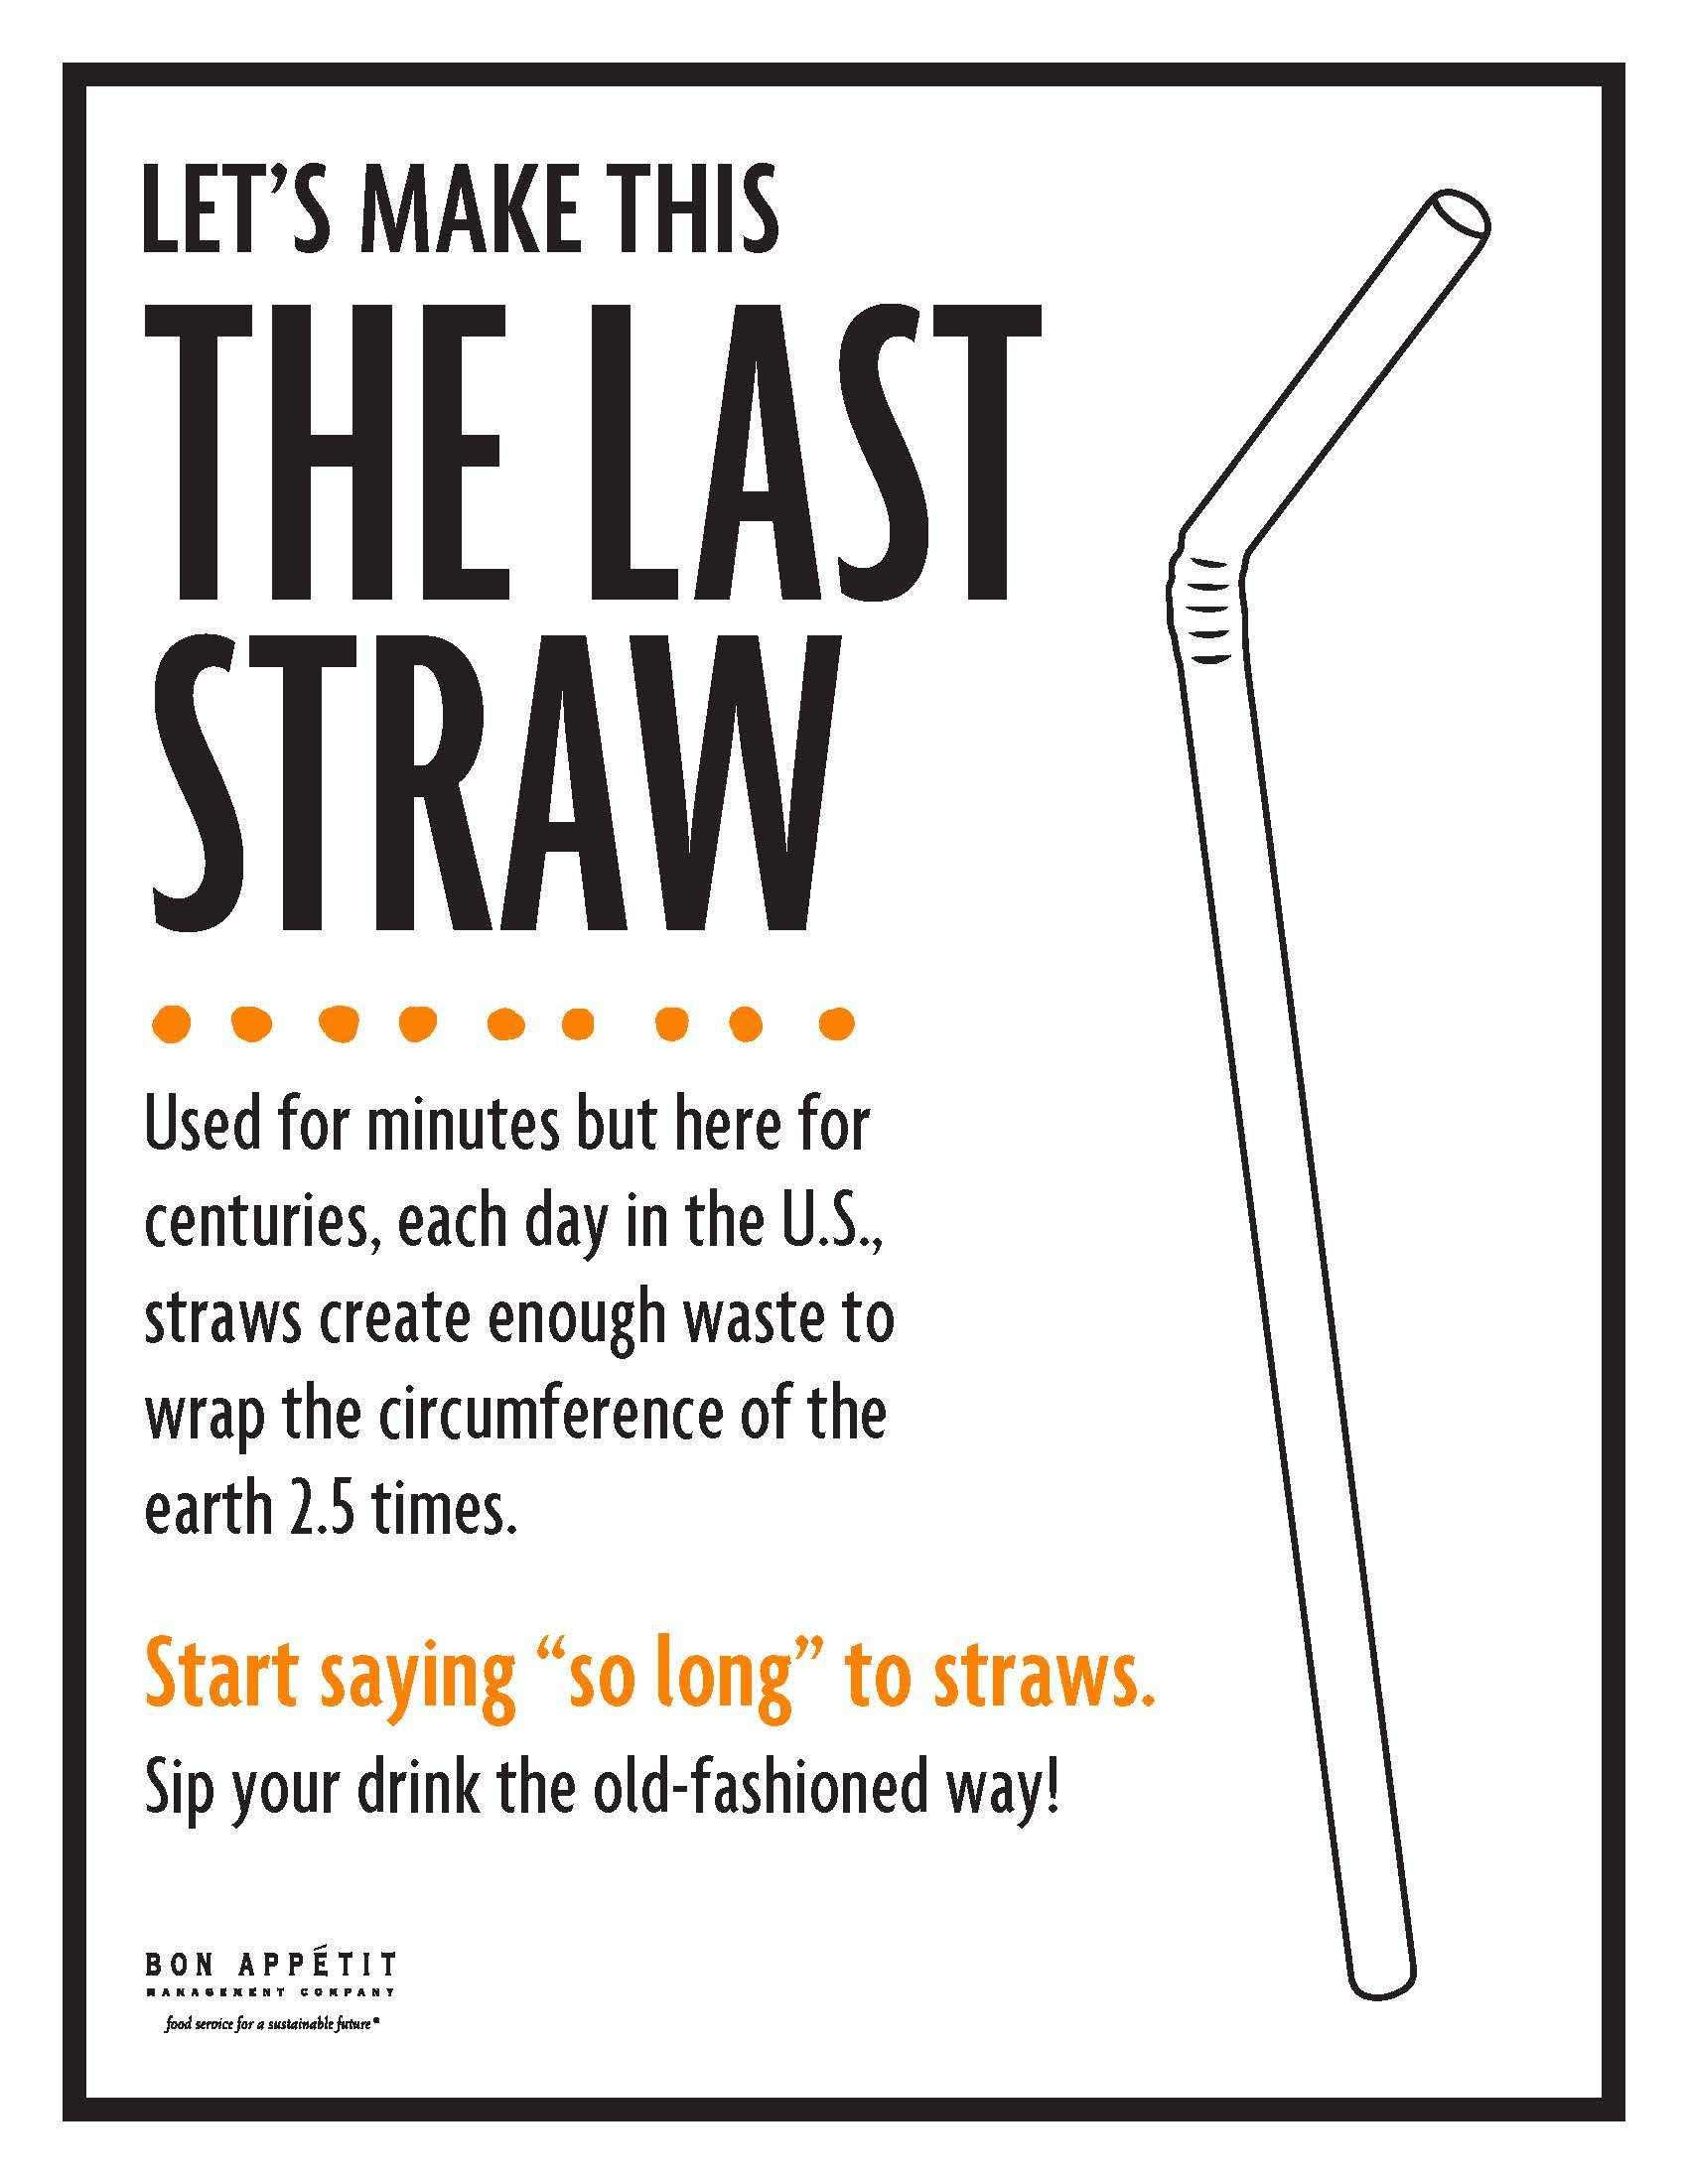 bon app u00e9tit management company bans plastic straws companywide